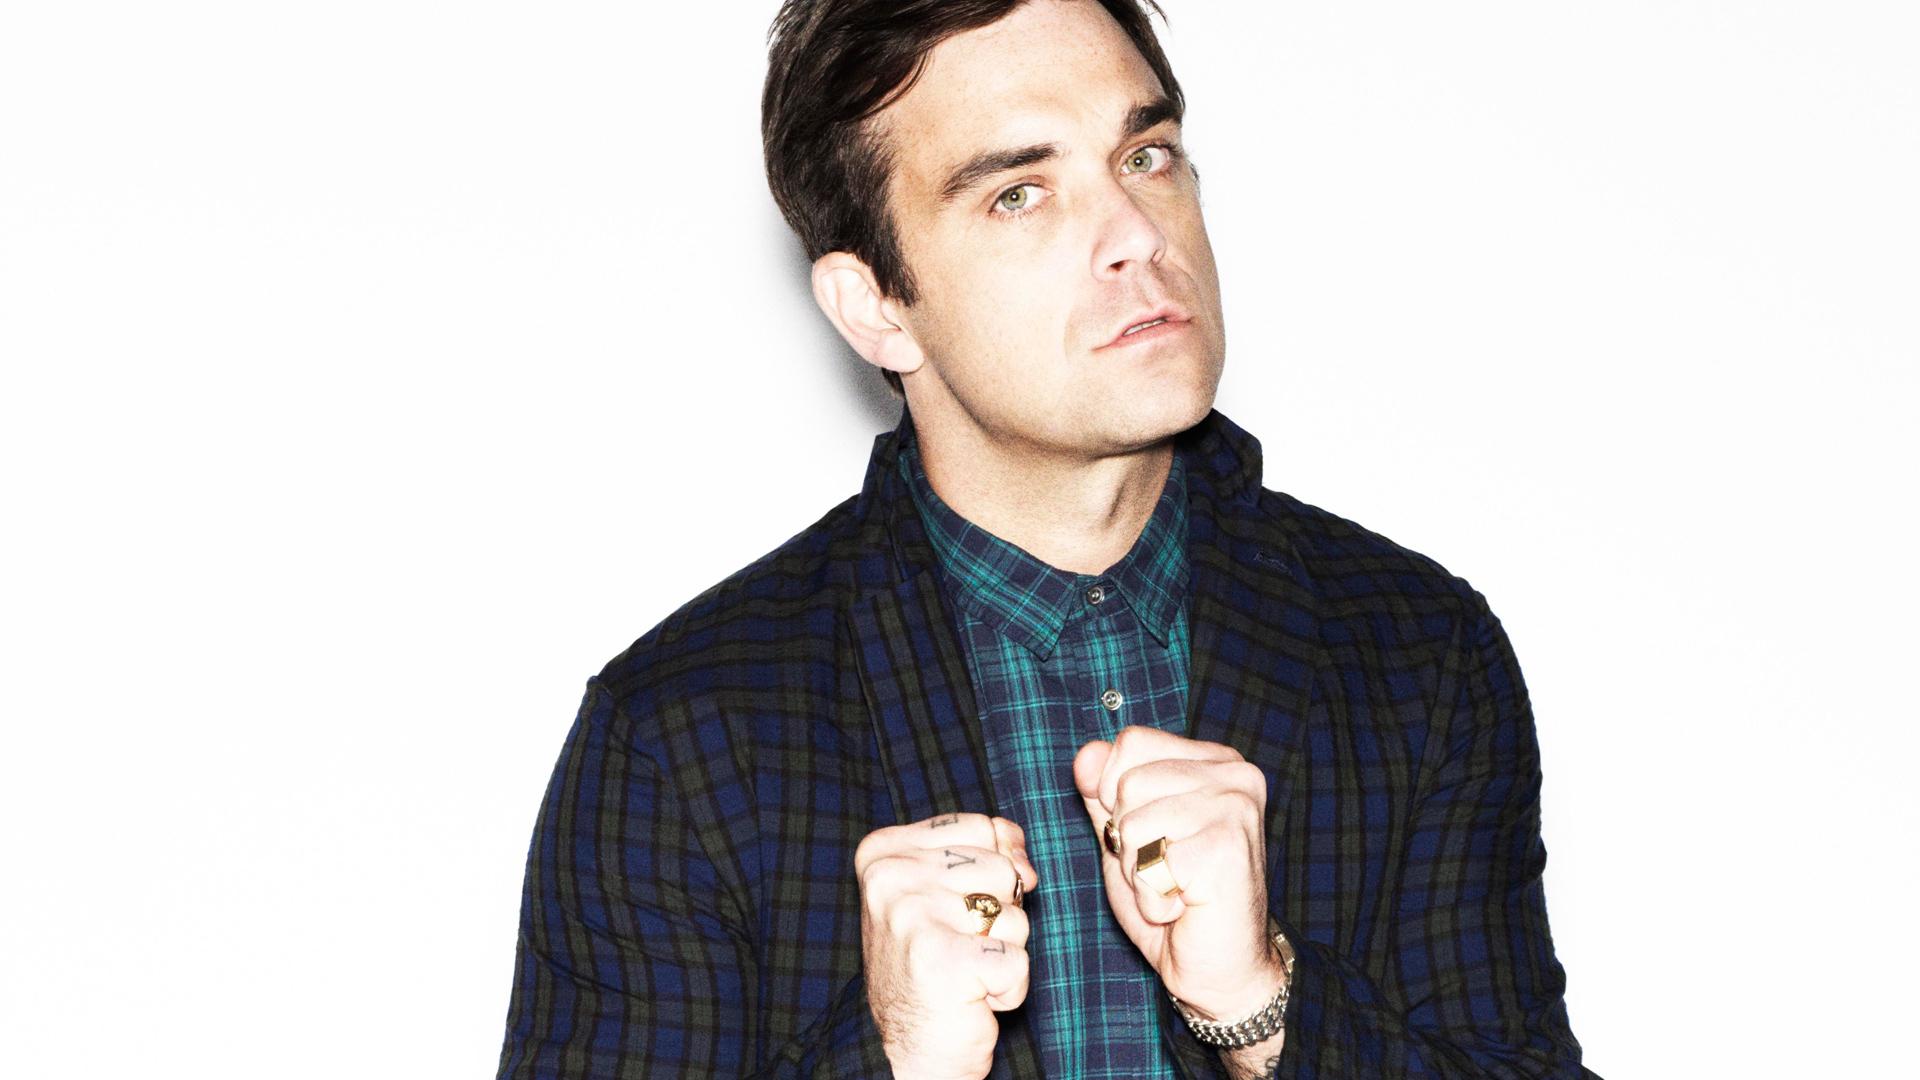 Robbie Williams Hd